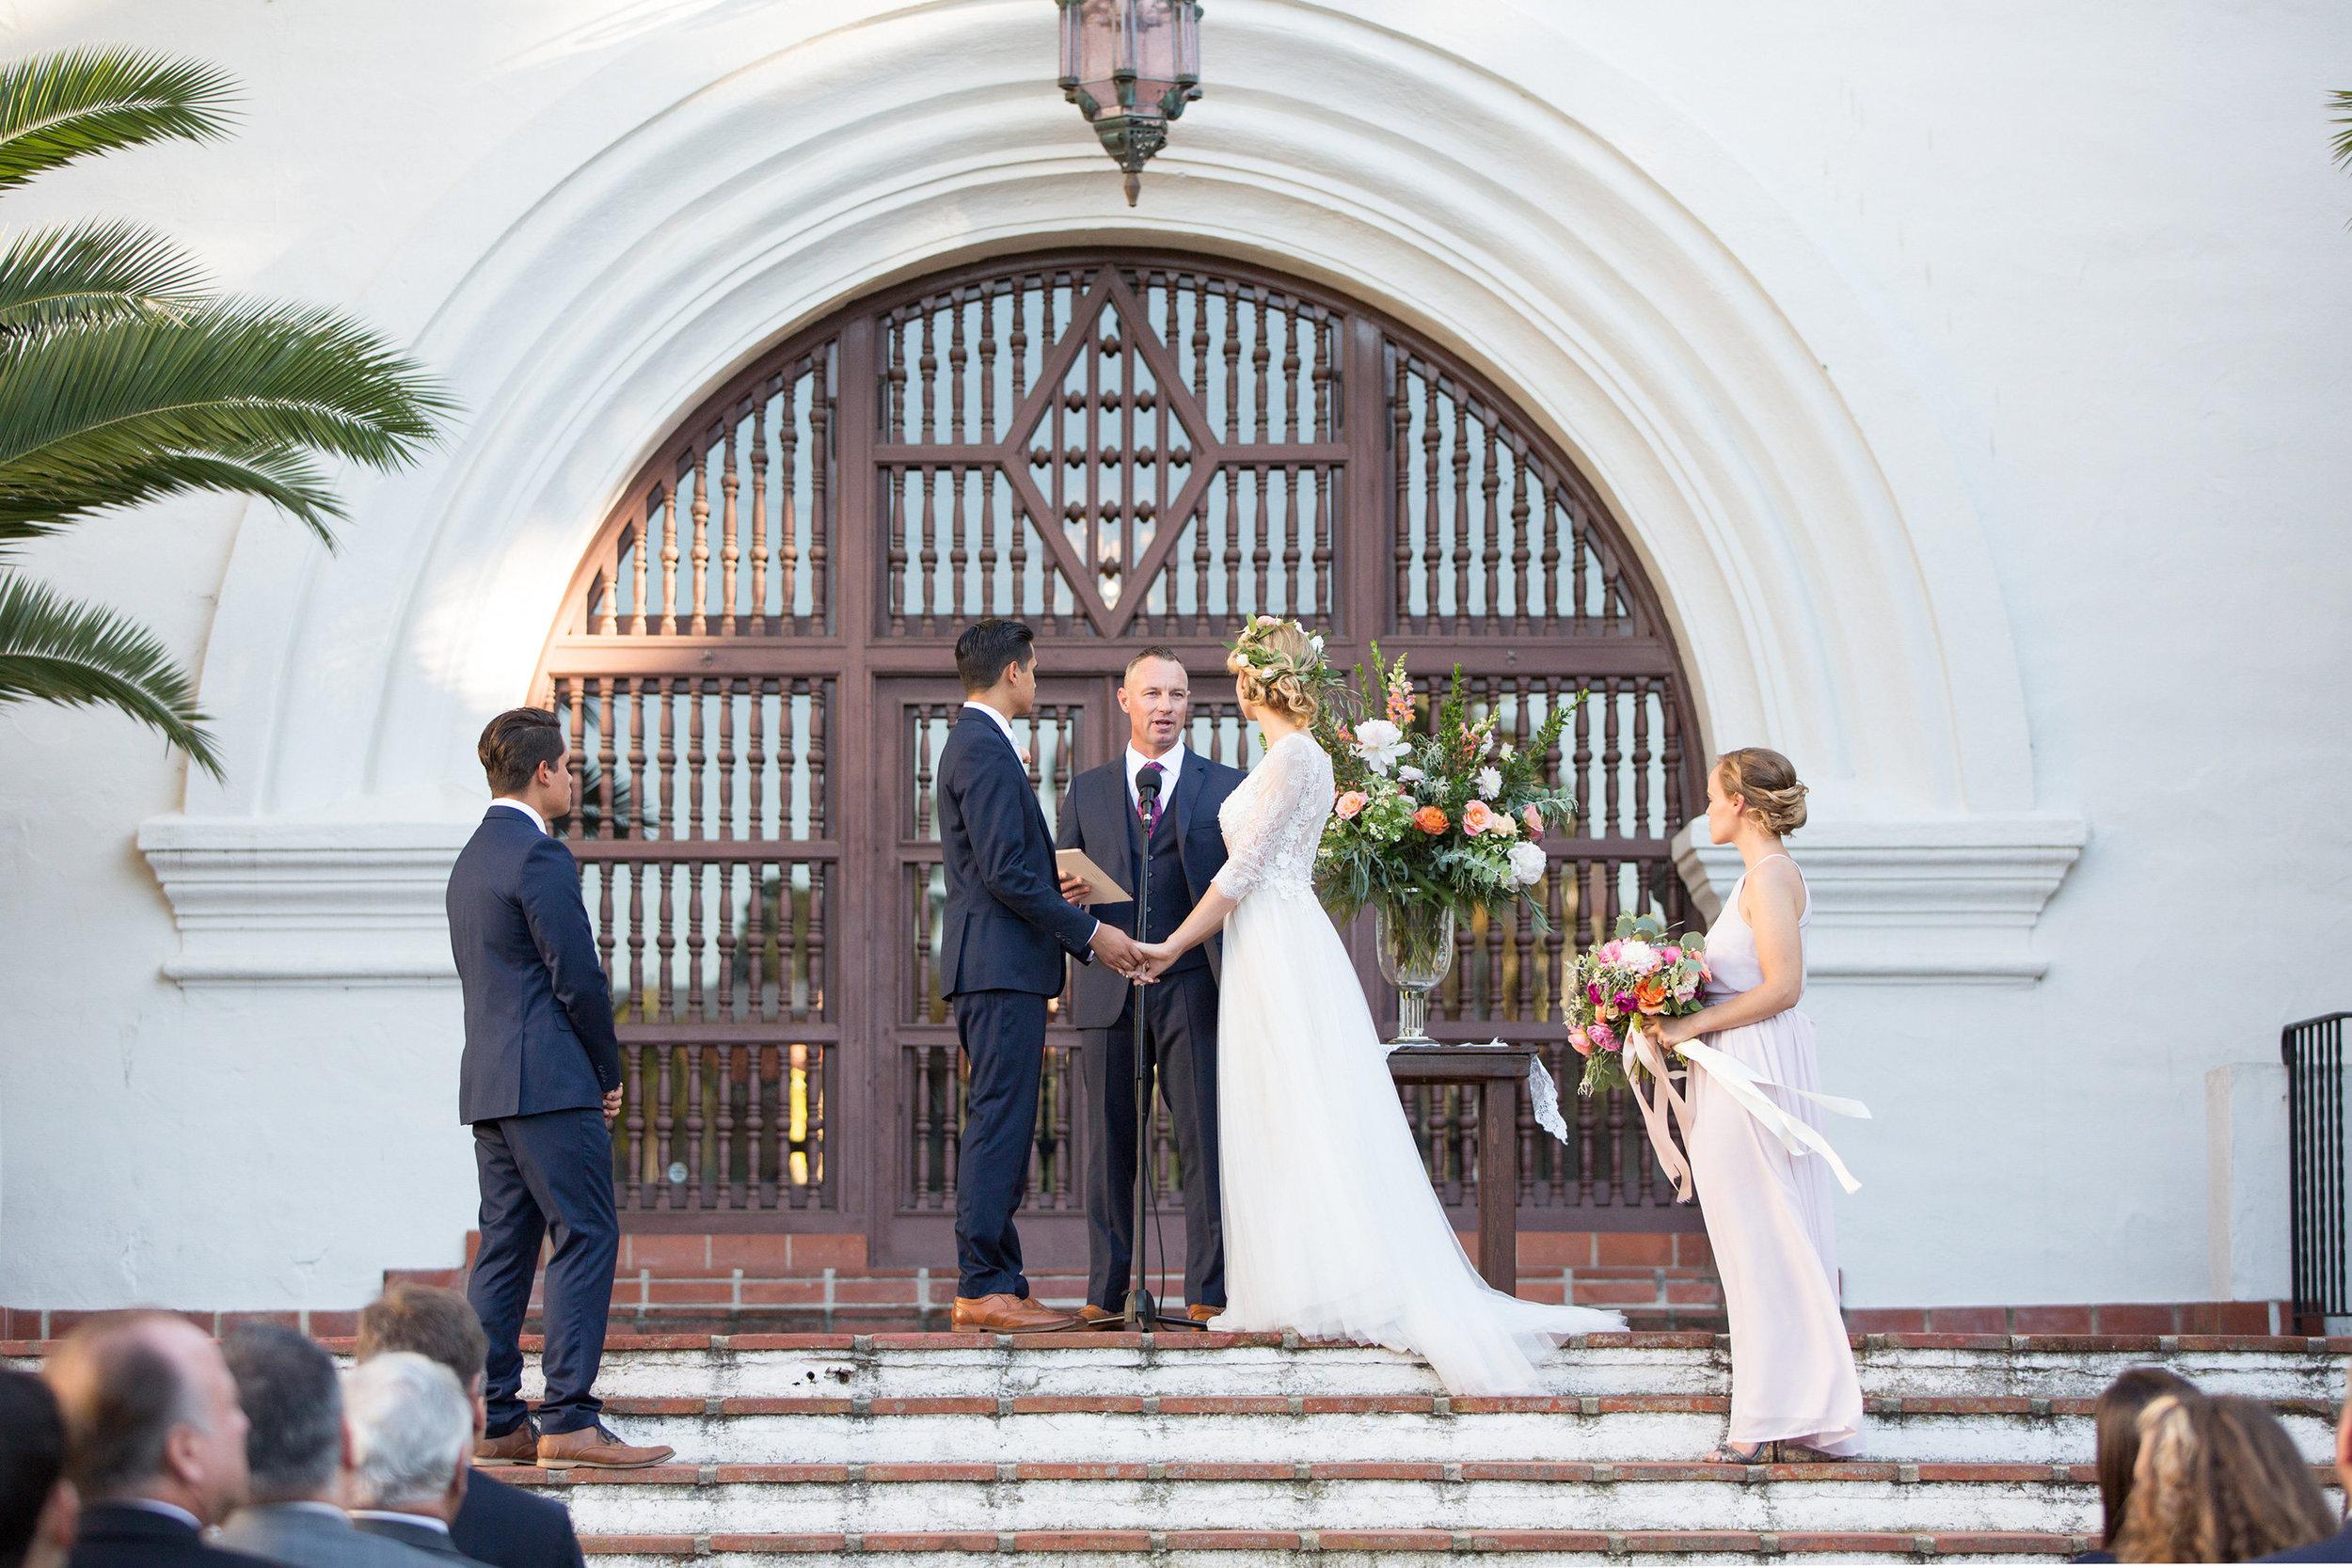 www.santabarbarawedding.com | Anna J Photography | Santa Barbara Courthouse | Ceremony | Bride and Groom | Vows